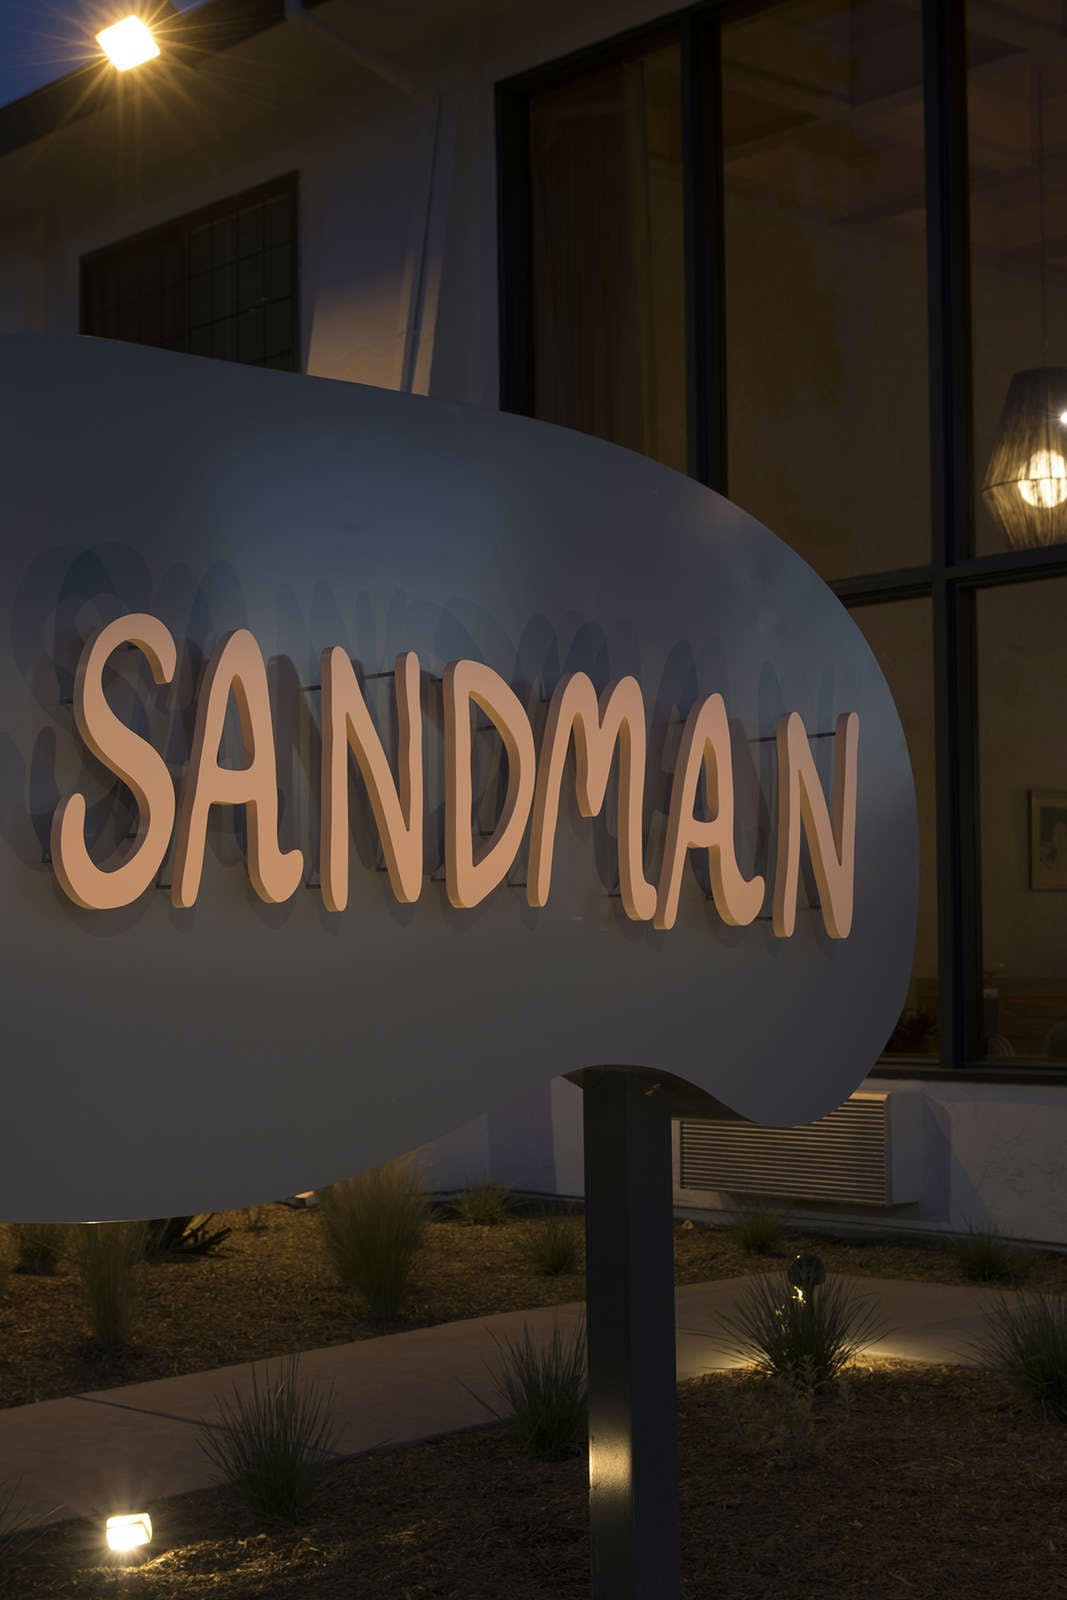 The Sandman Hotel